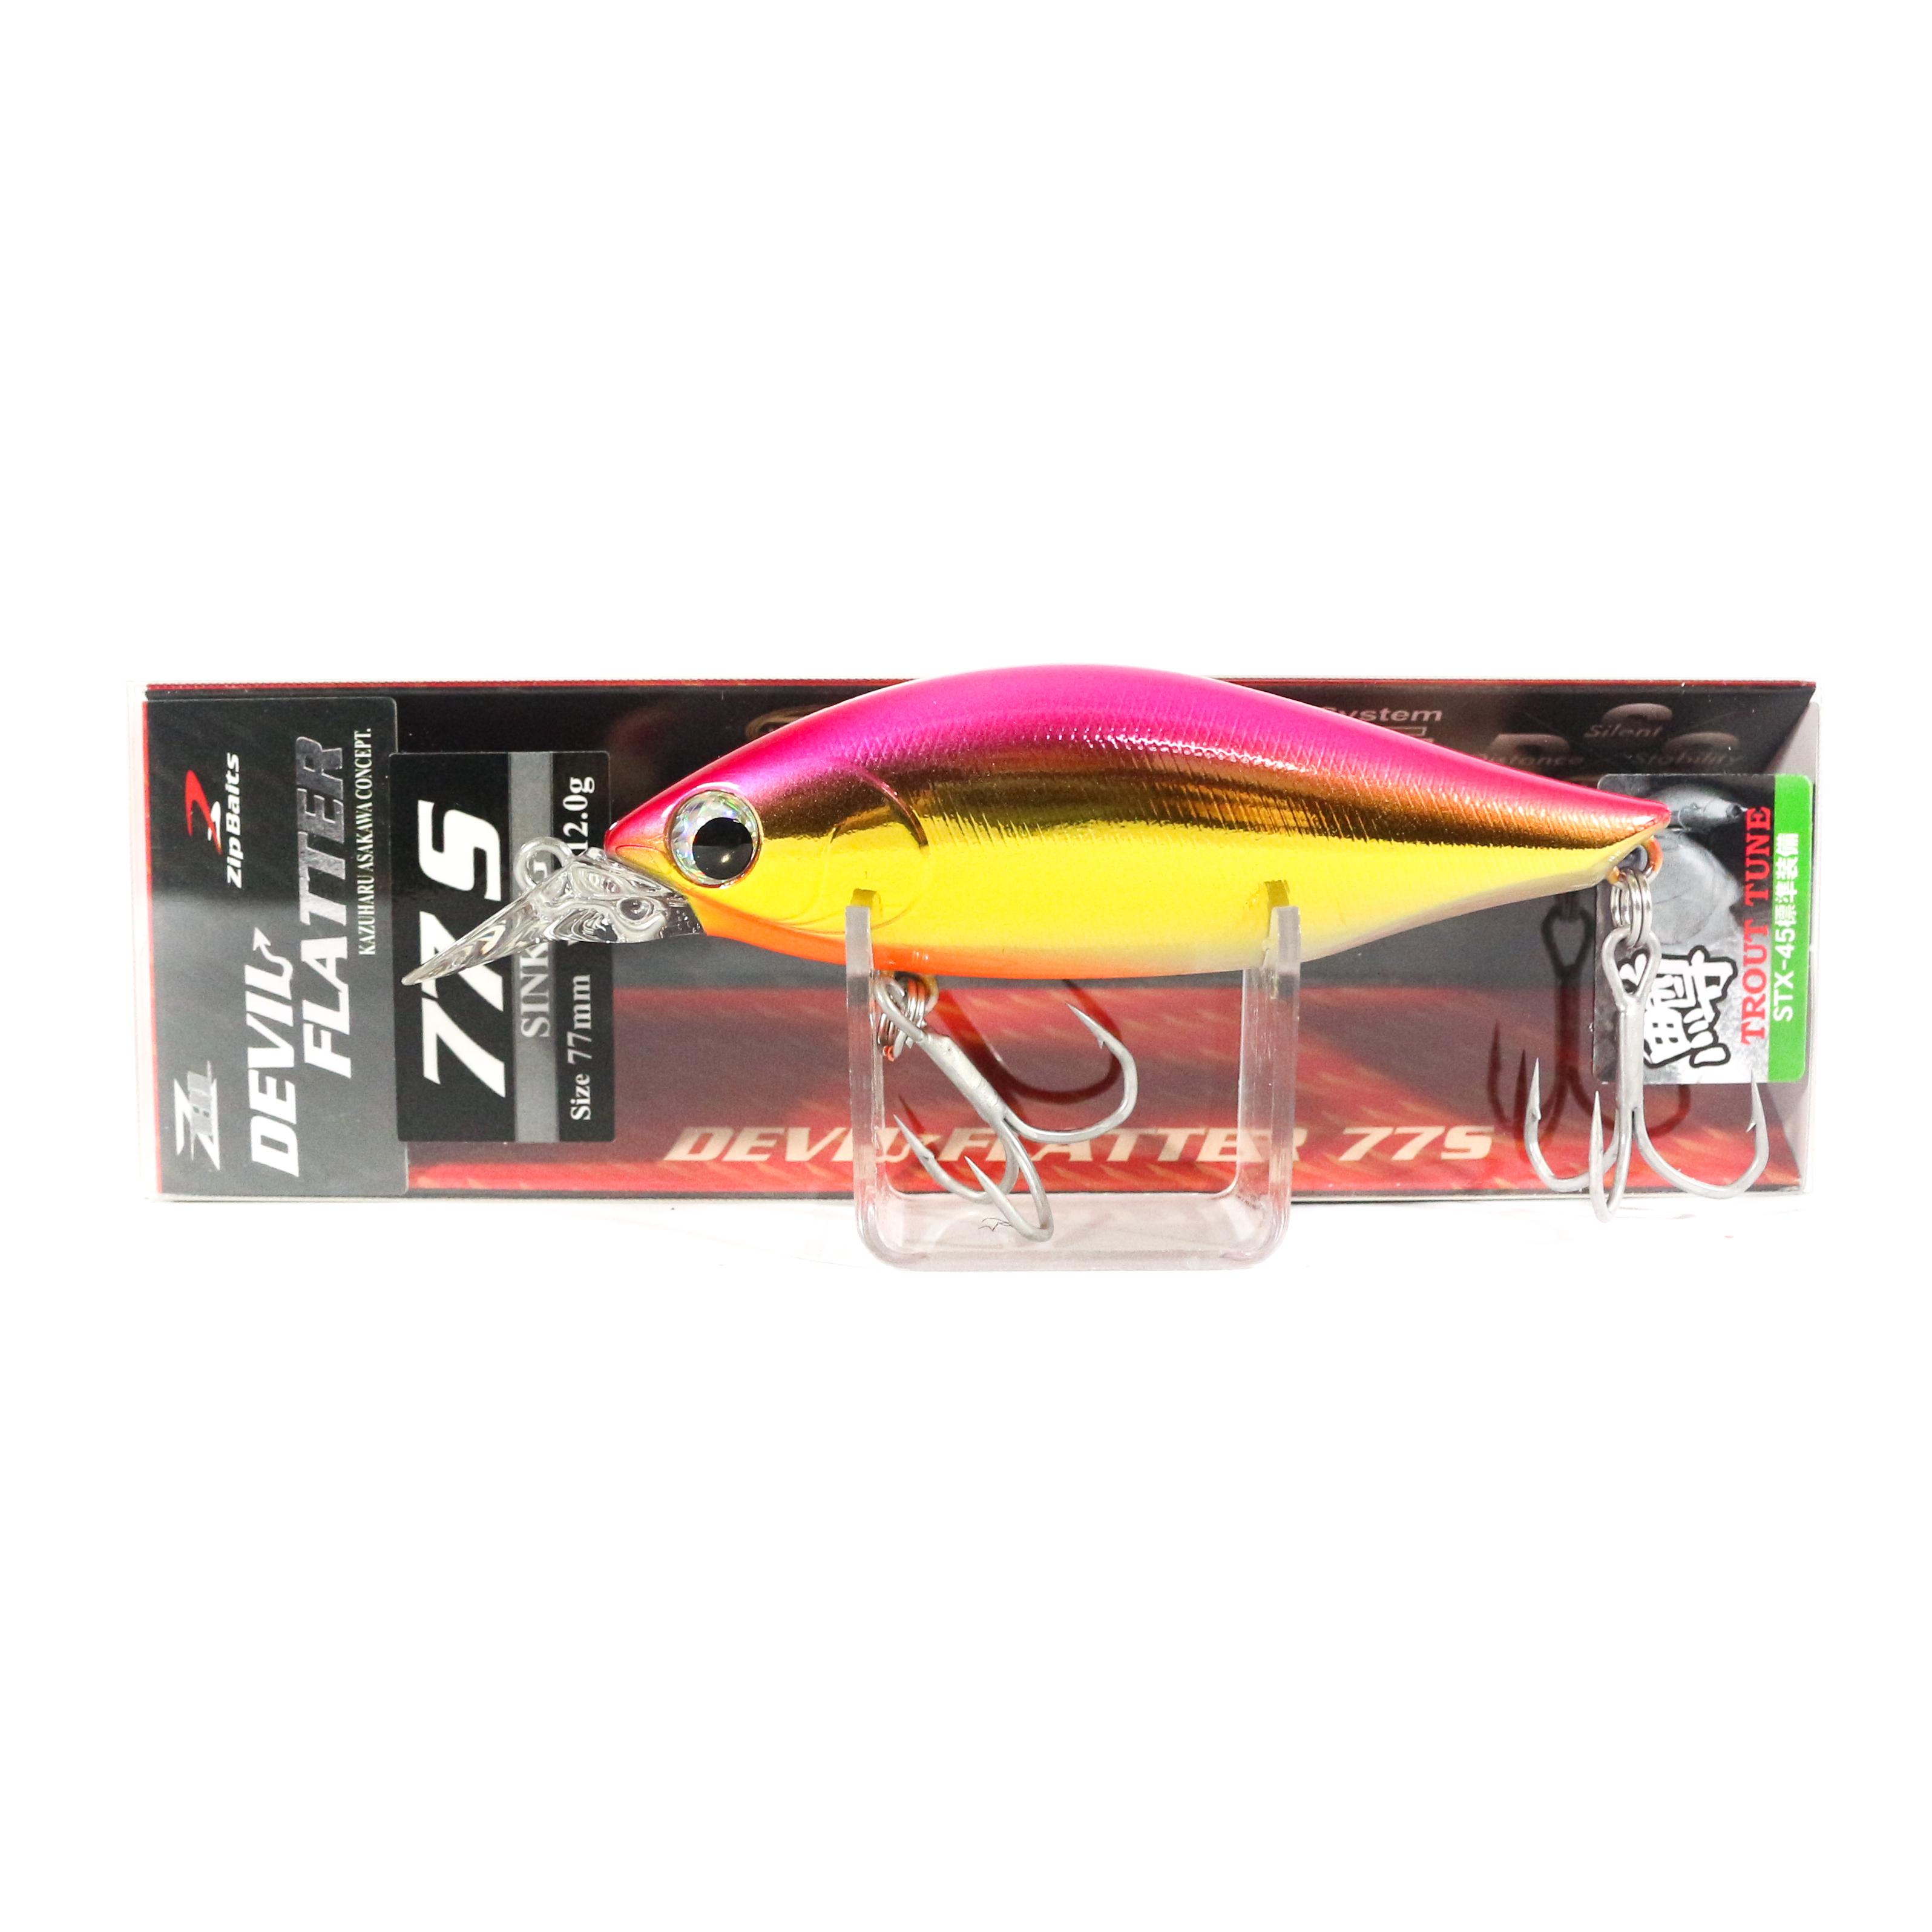 Zipbaits Devil Flatter 77S Sinking Lure 218 (4015)